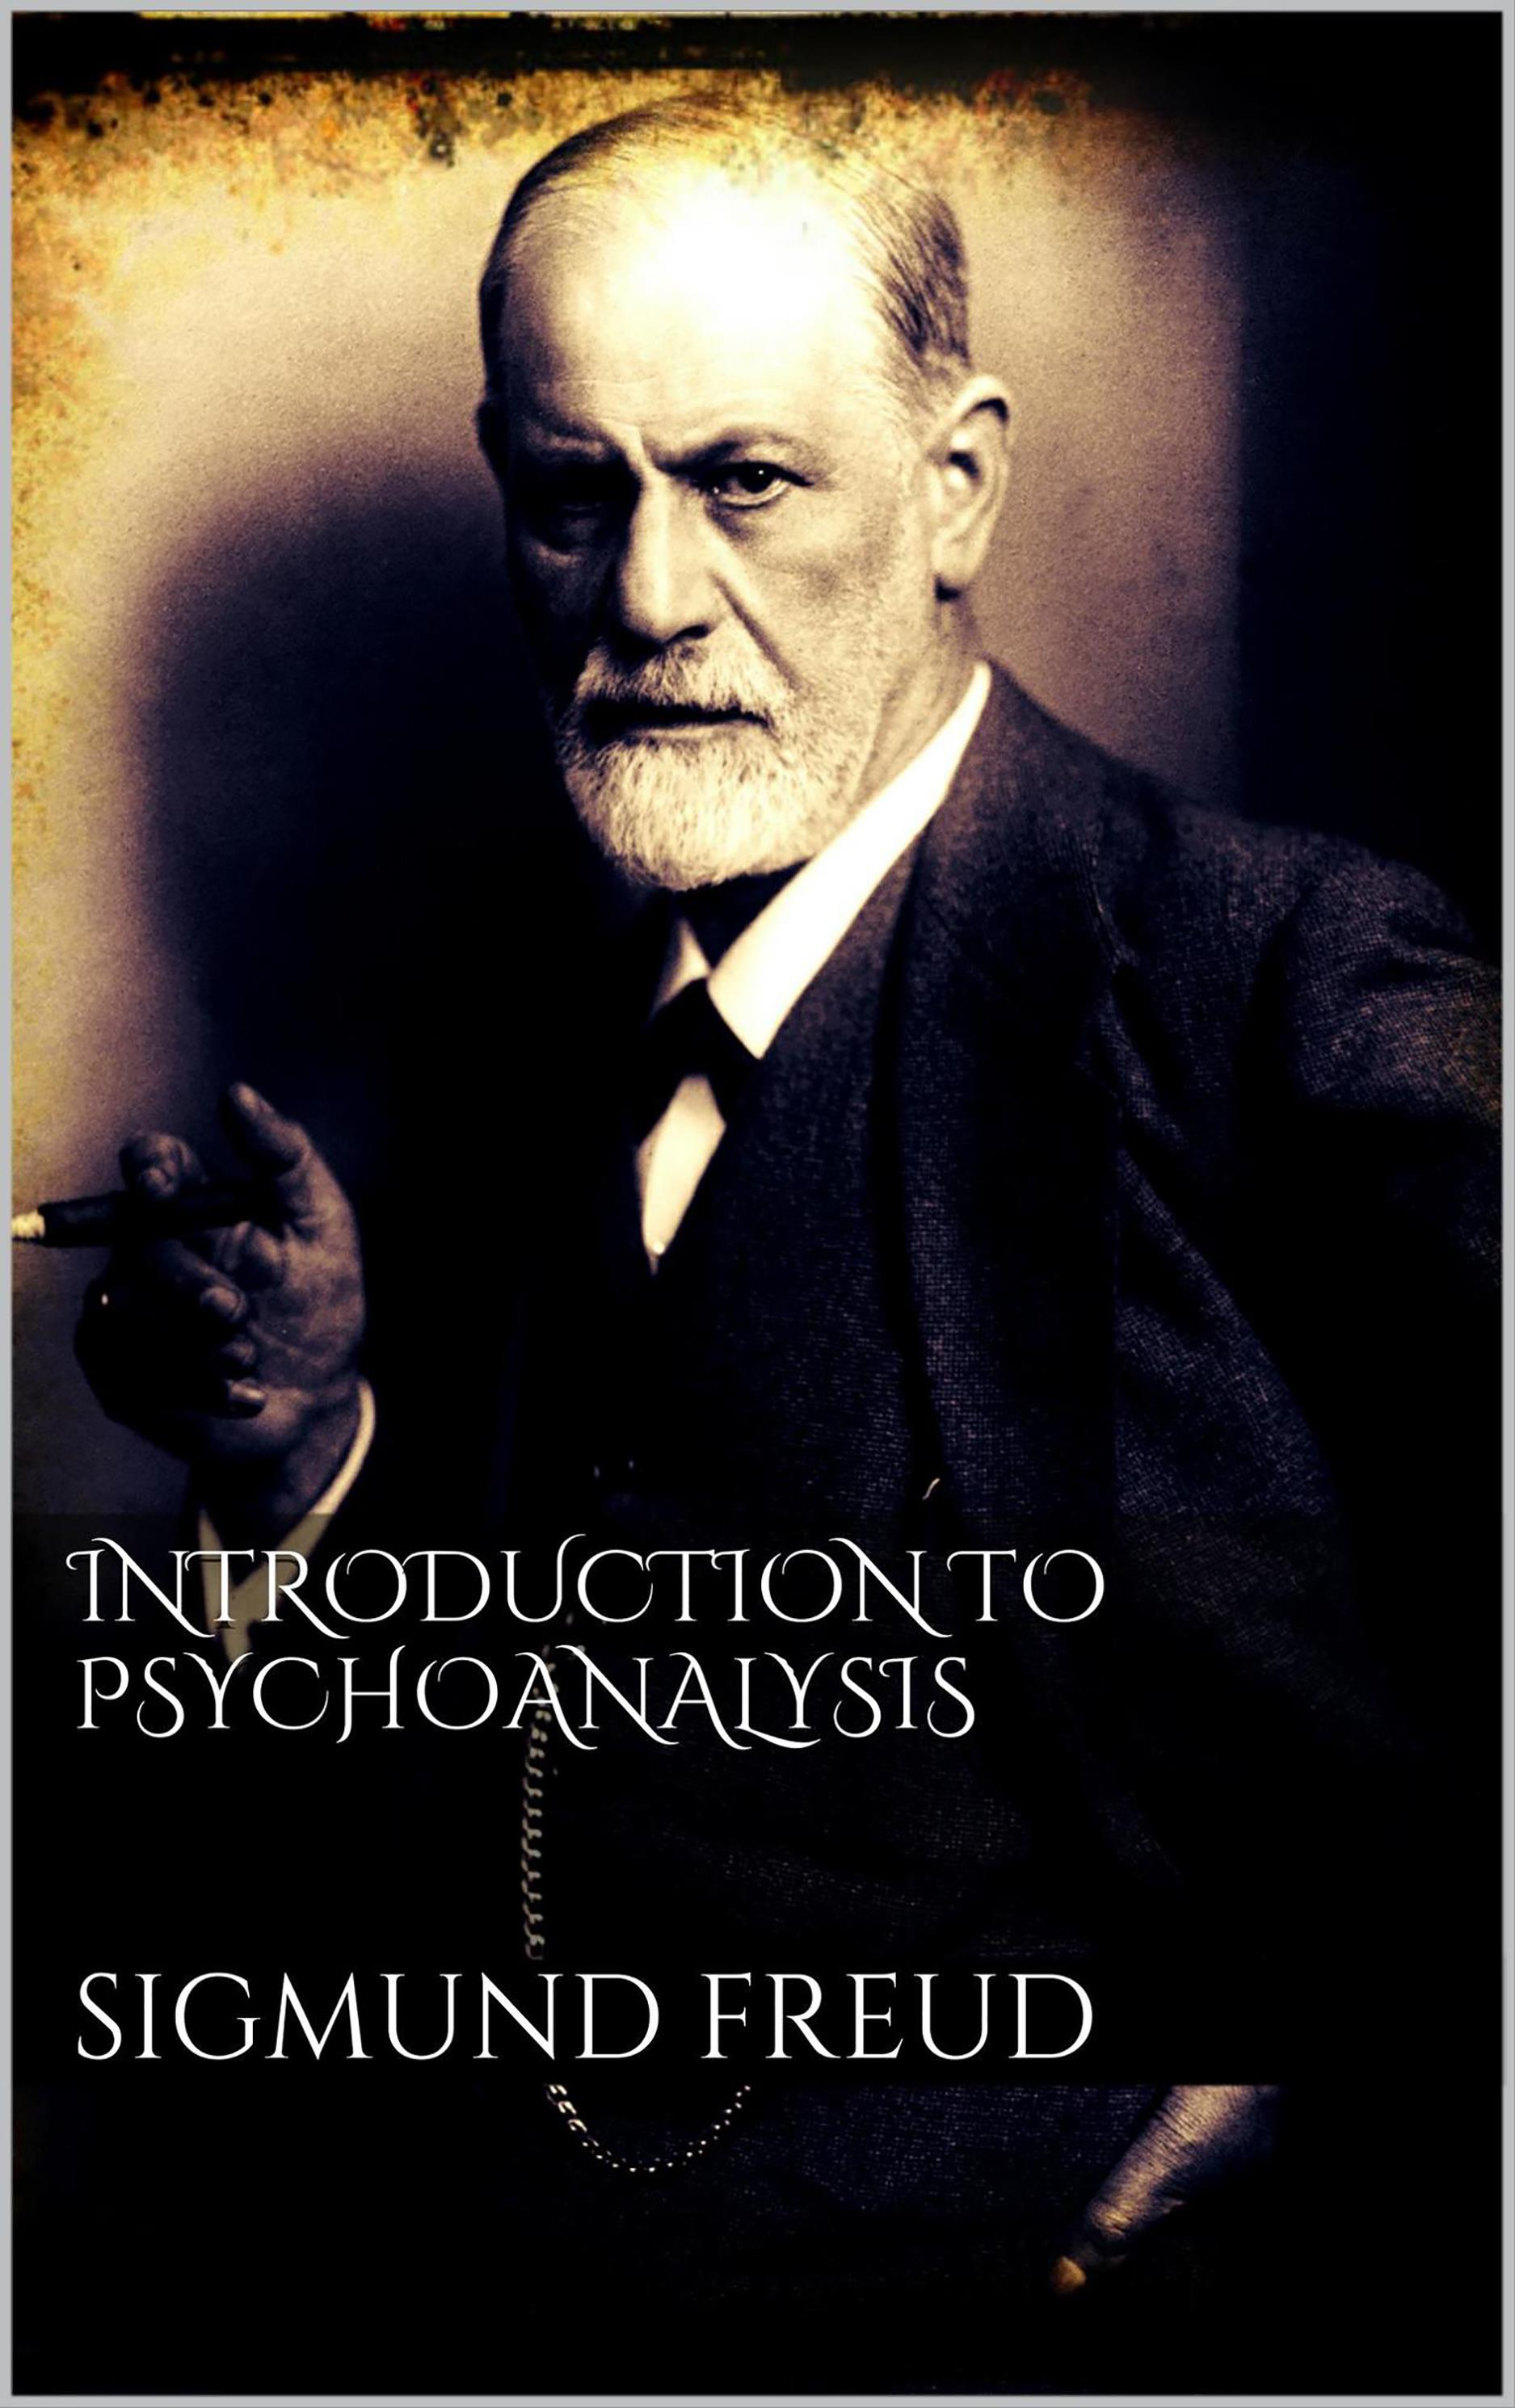 Introduction to Psychoanalysis